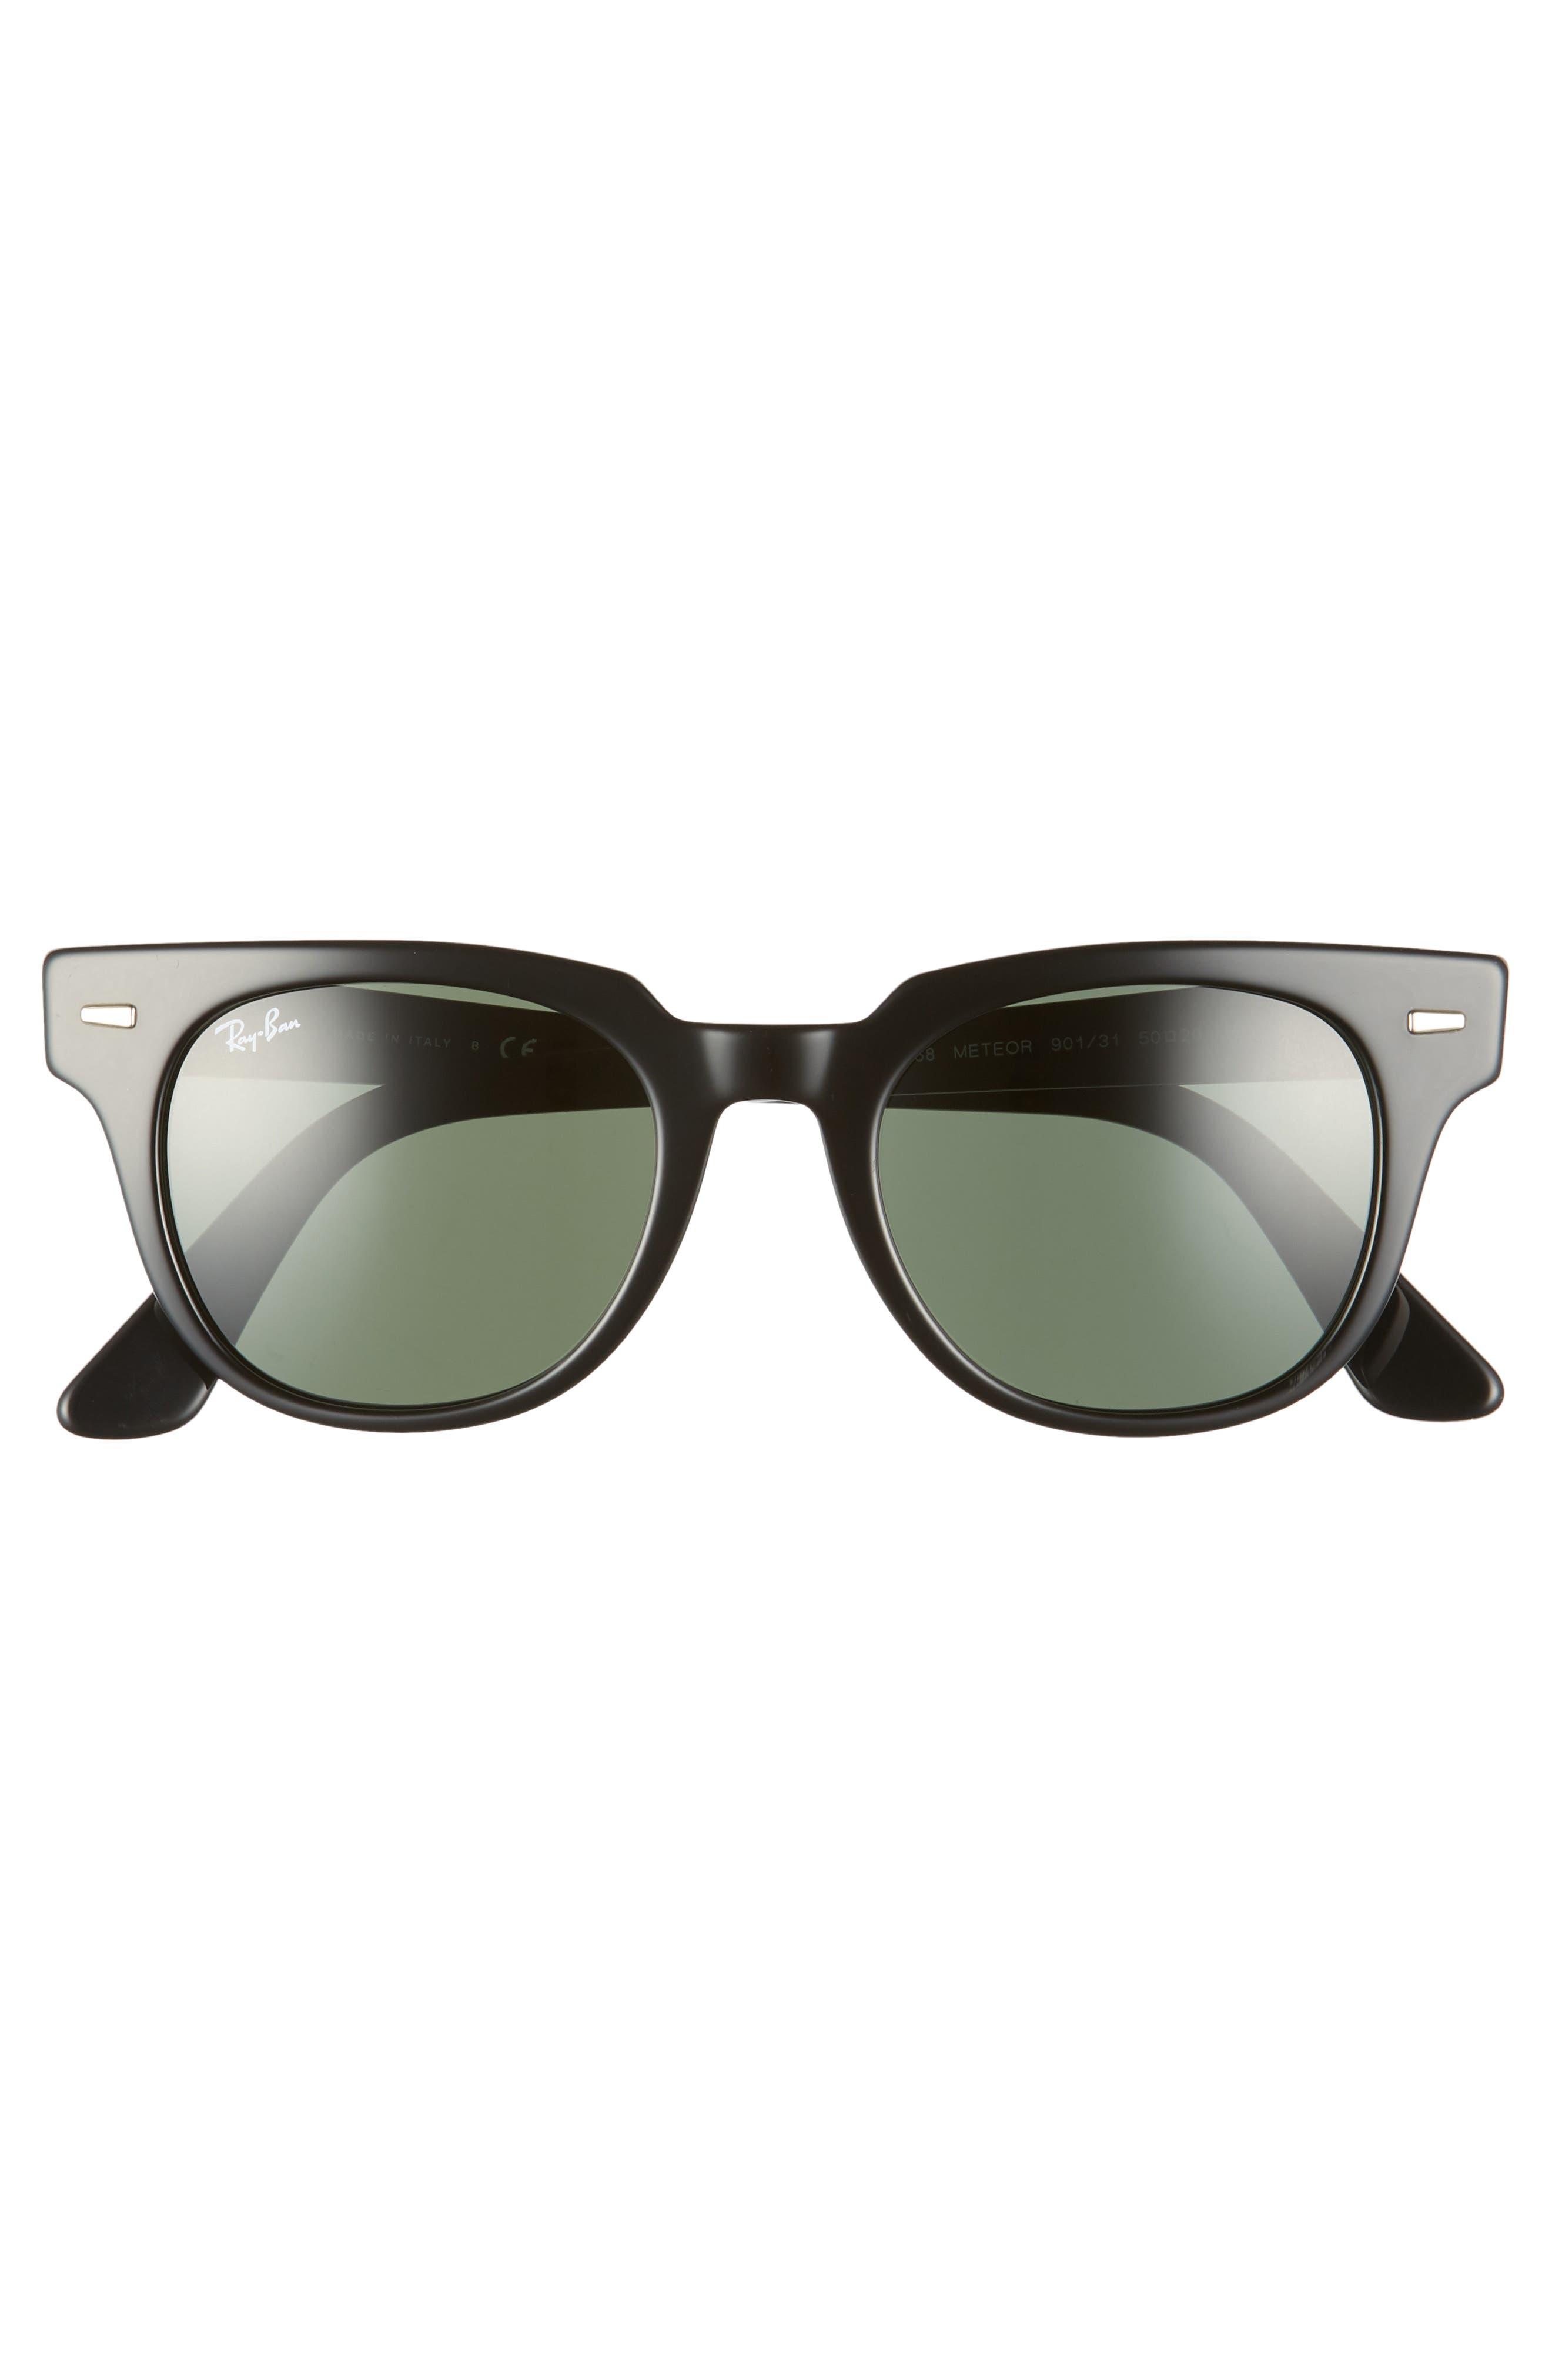 Meteor 50mm Wayfarer Sunglasses,                             Alternate thumbnail 3, color,                             BLACK SOLID